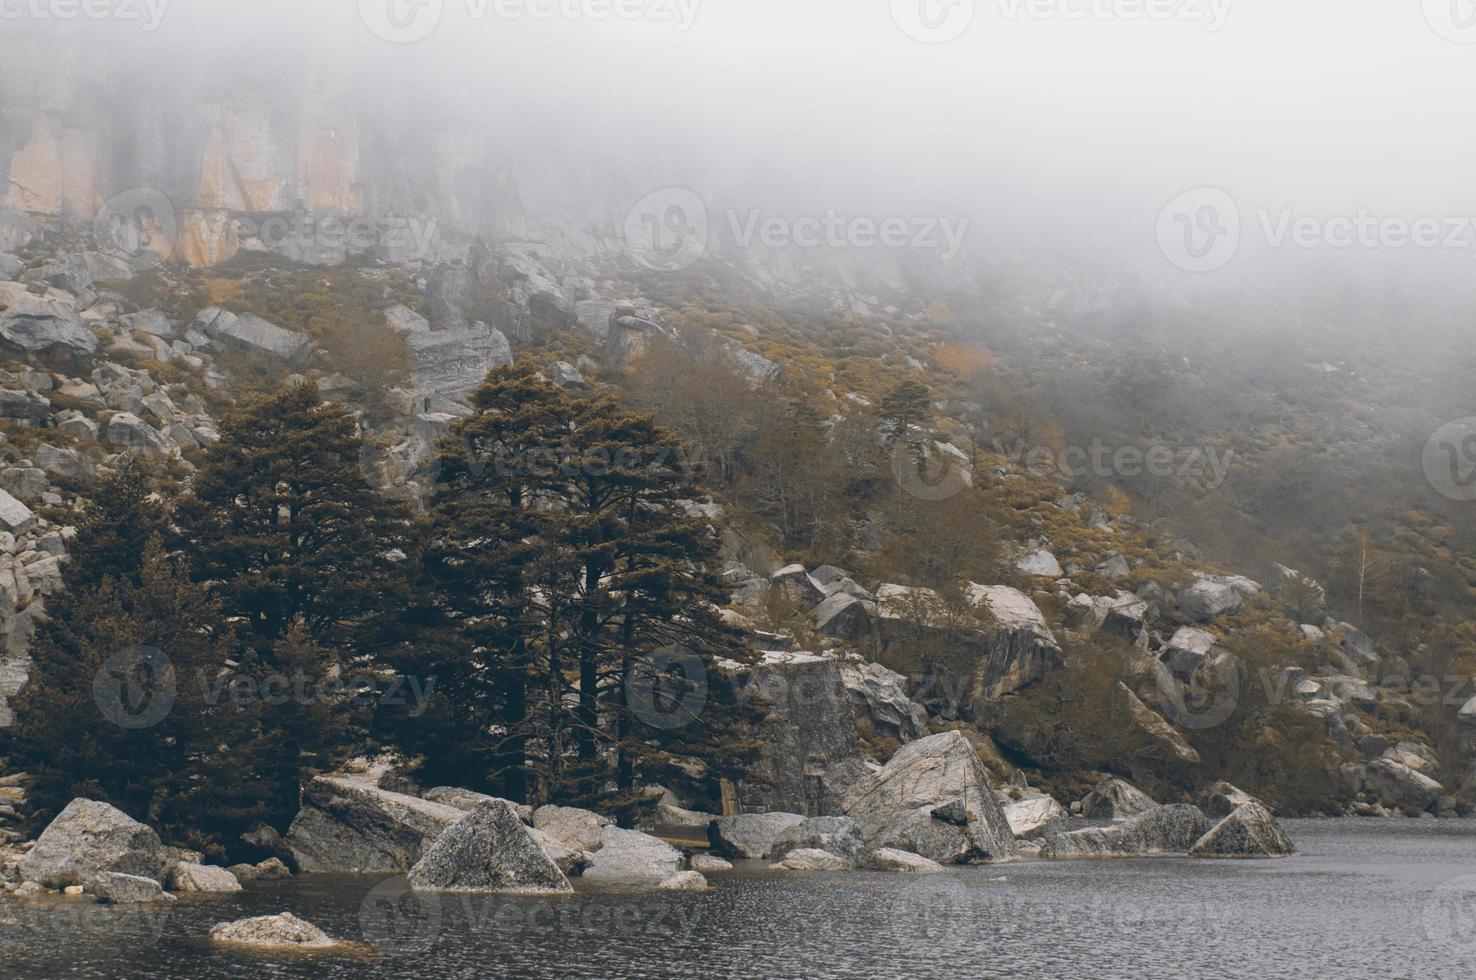 laguna negra meer, soria, spanje foto